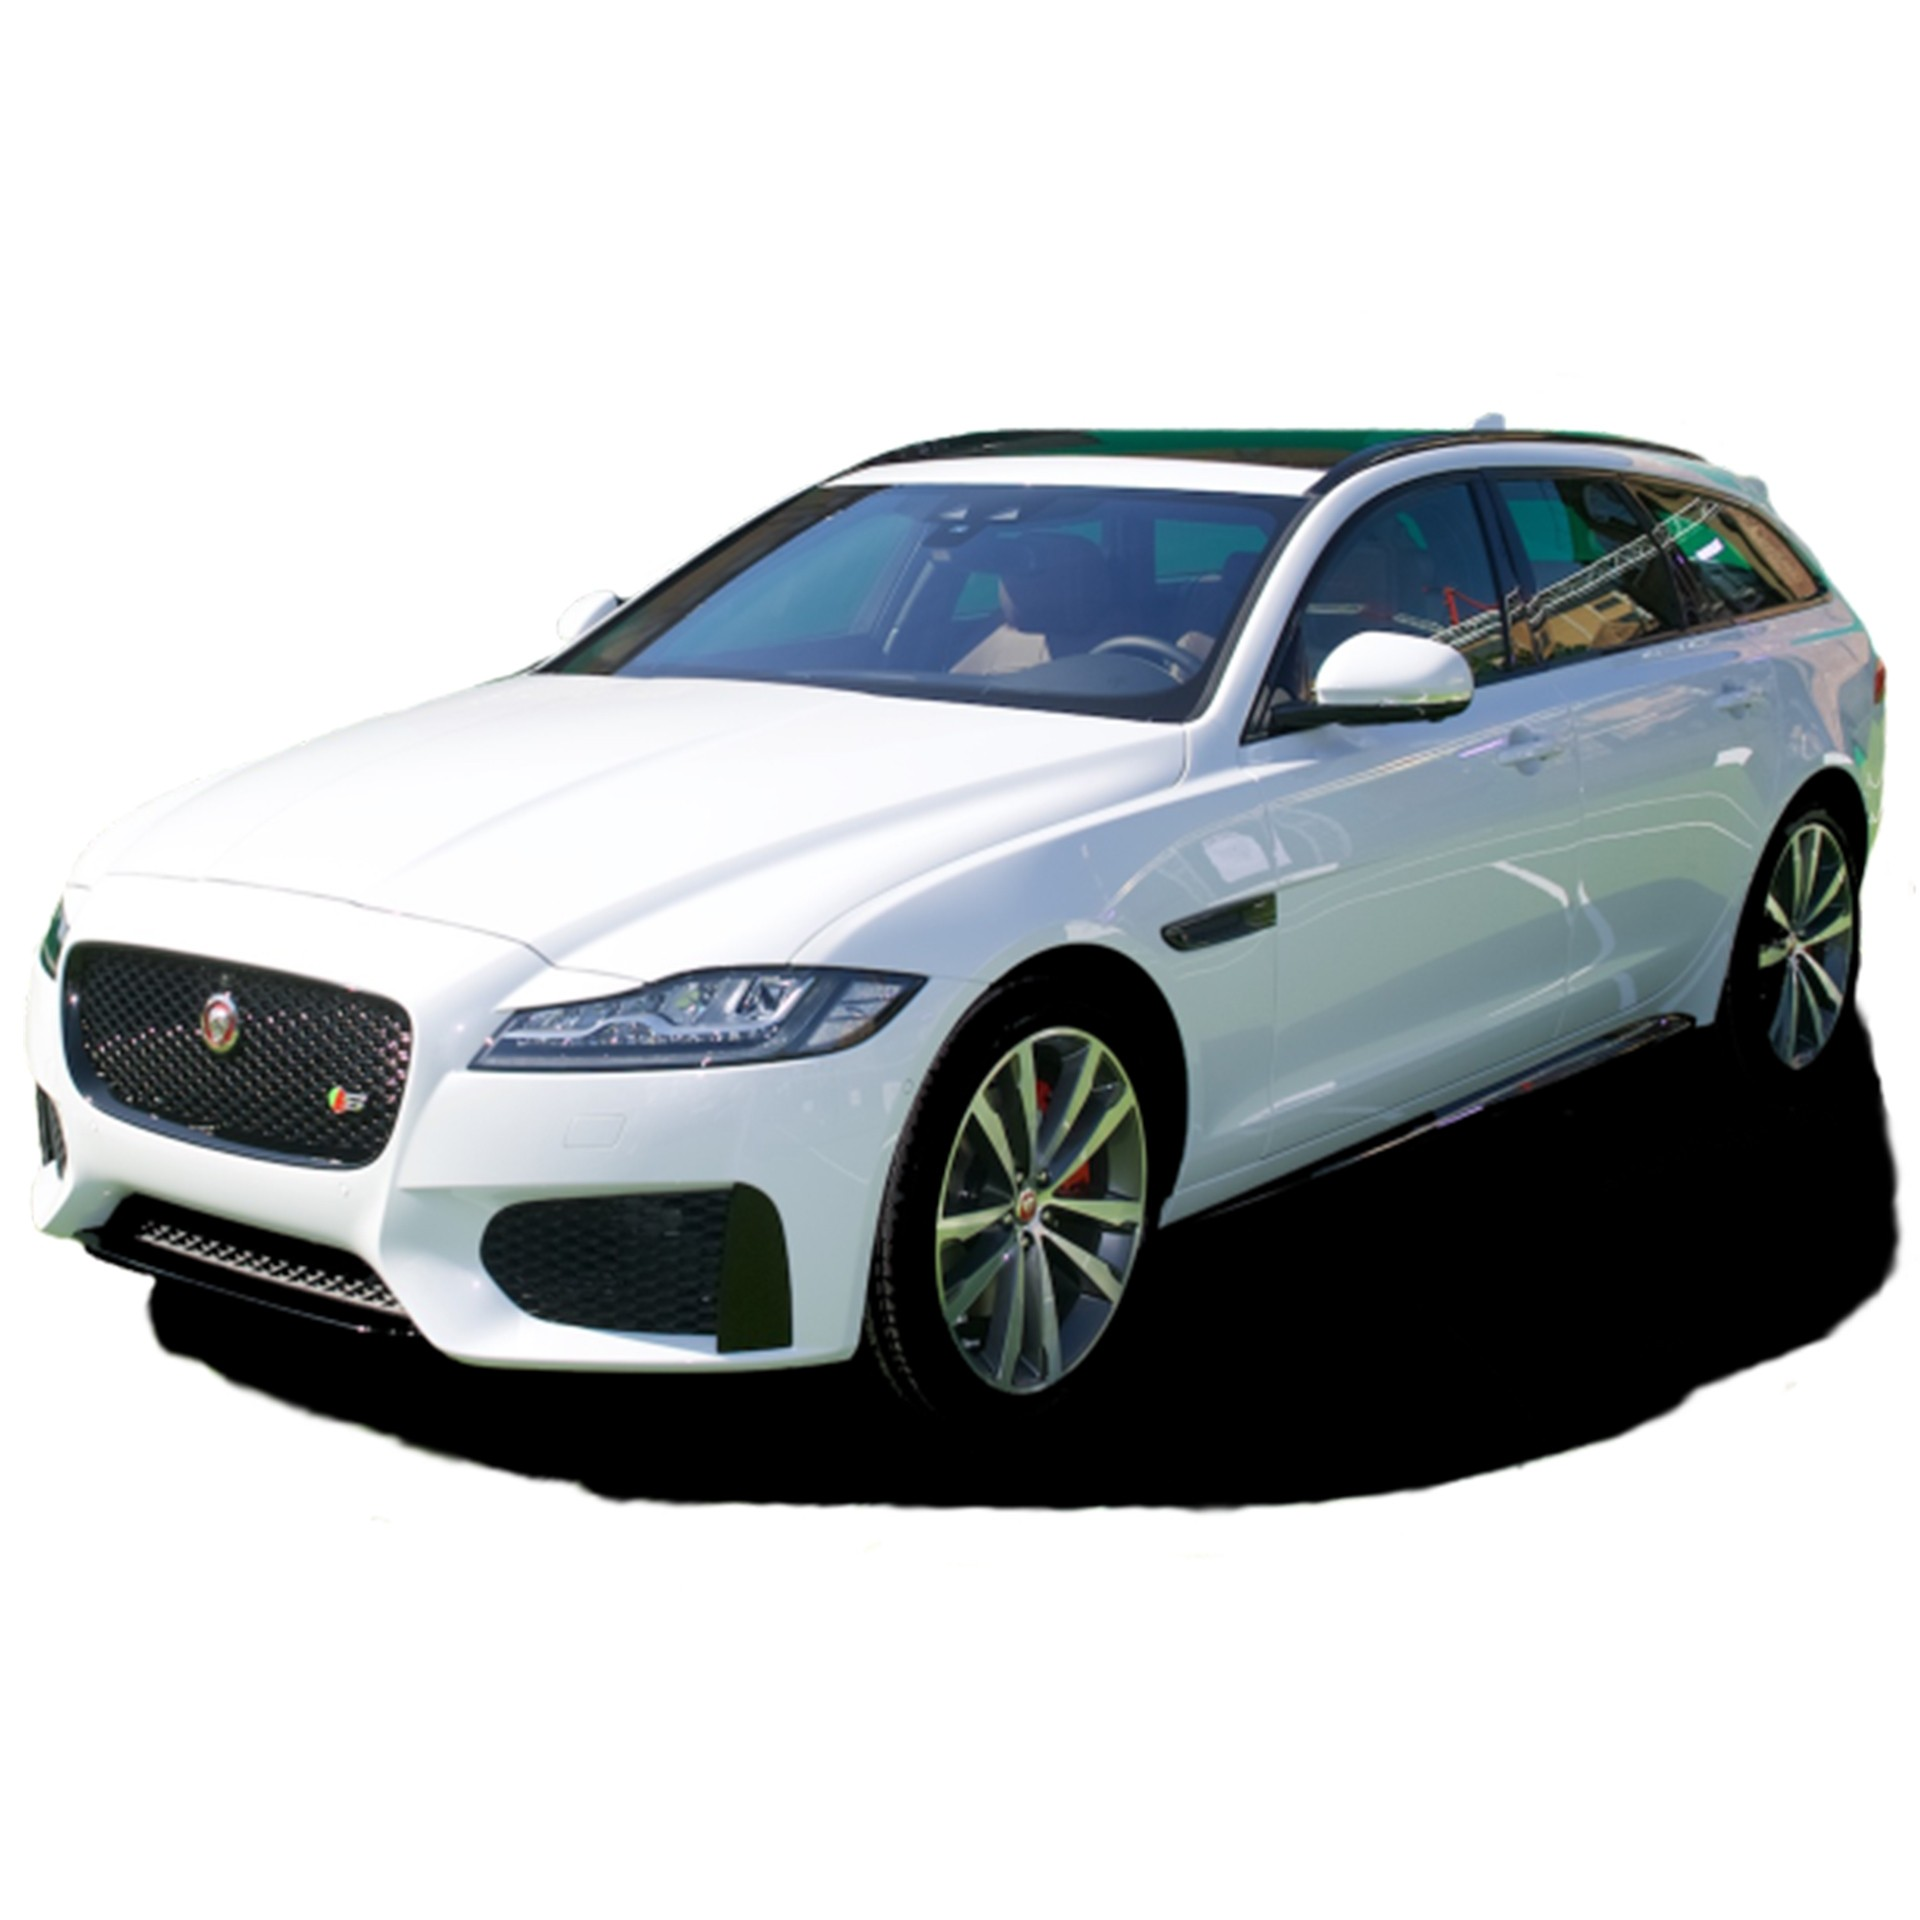 Jaguar Xf Sportbrake: Noleggio A Lungo Termine JAGUAR XF SPORTBRAKE